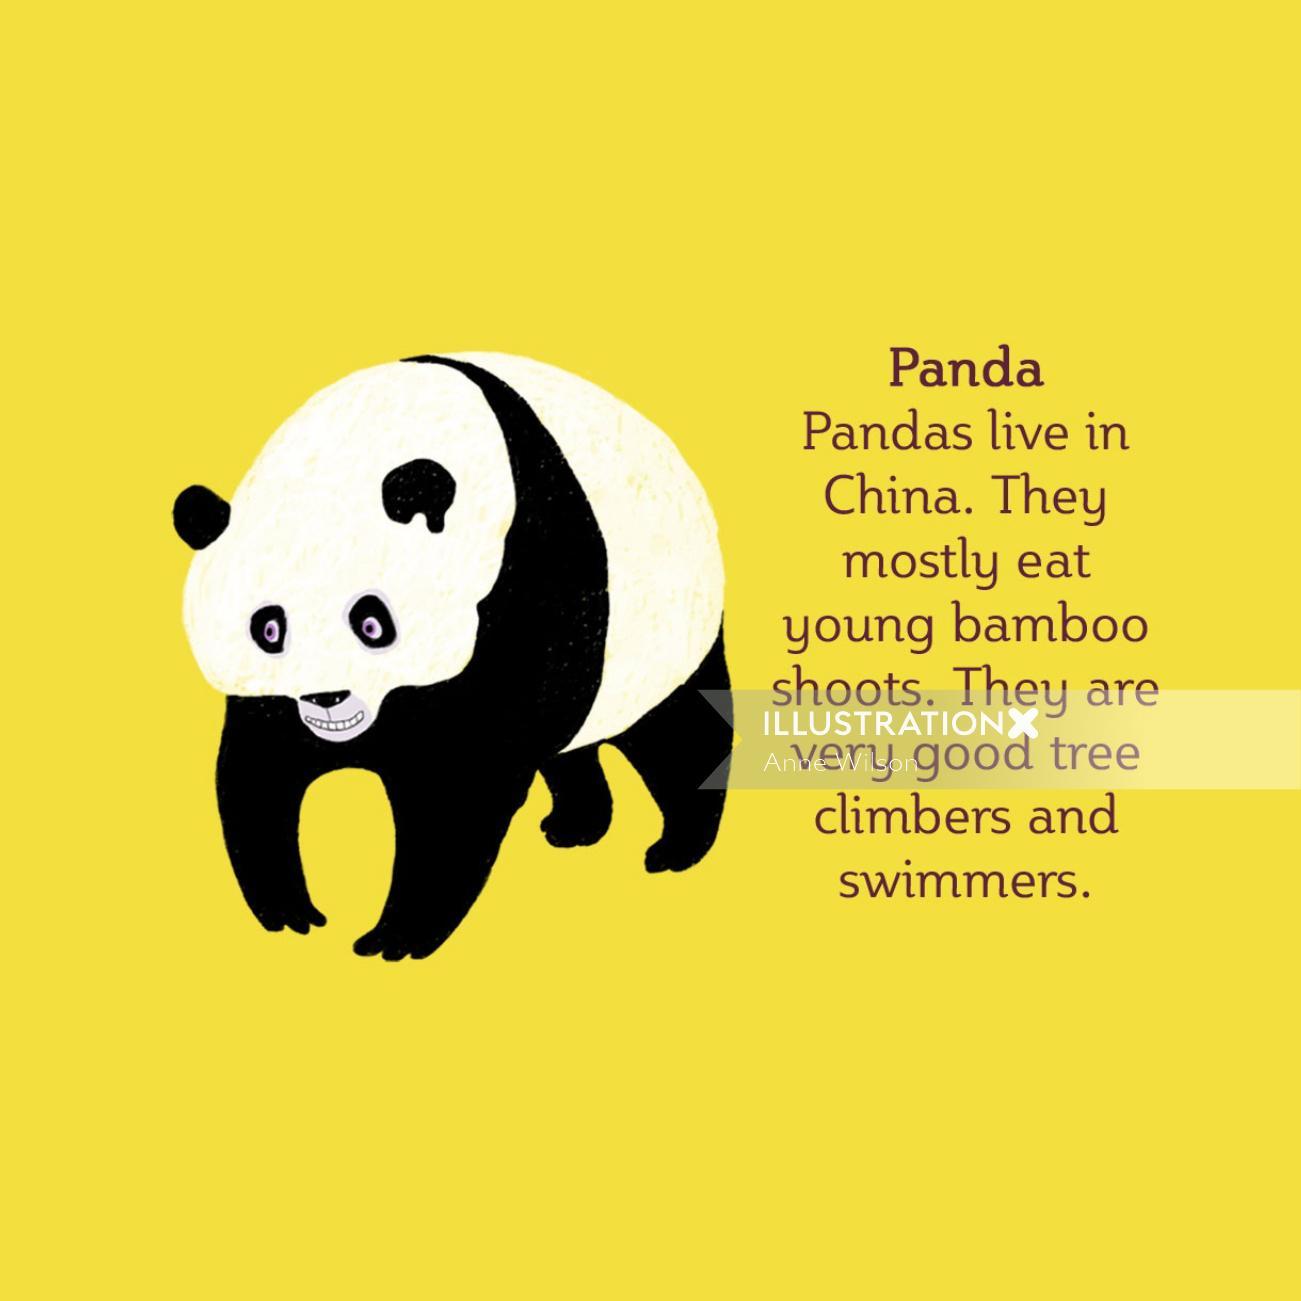 Panda | Animal illustration collection